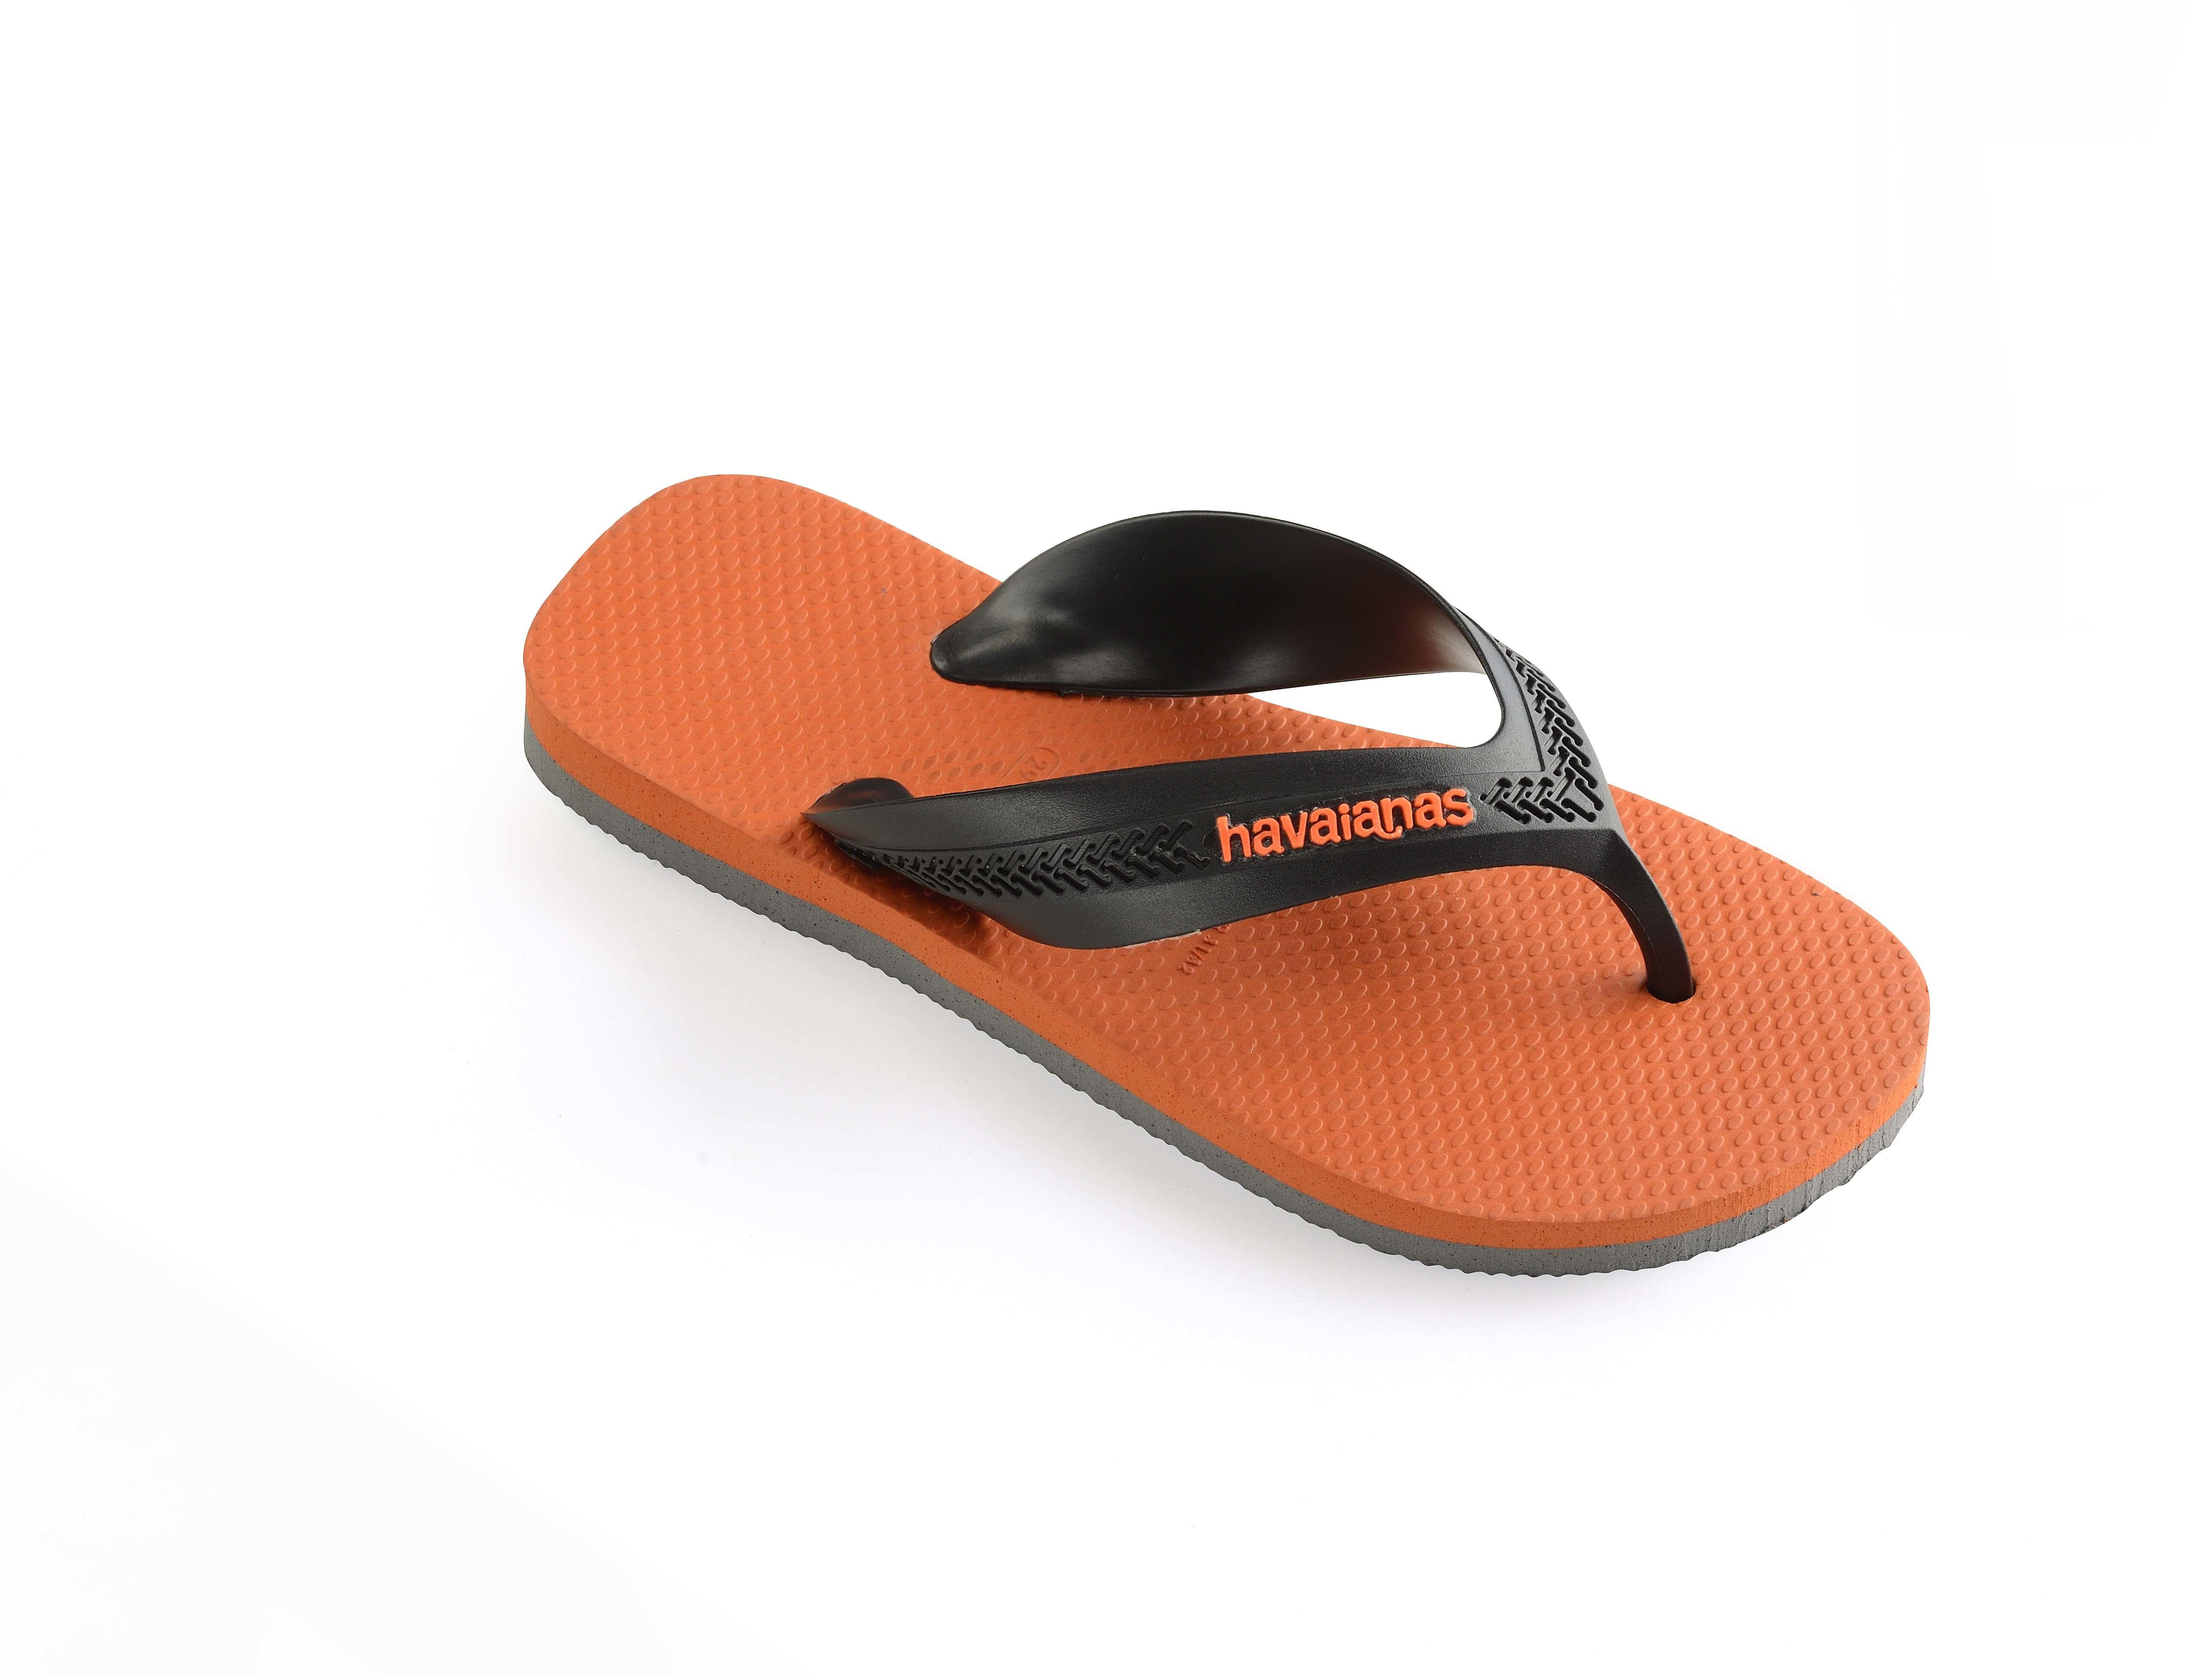 34aad192cb47 havaianas Max Sandals Children orange at Addnature.co.uk